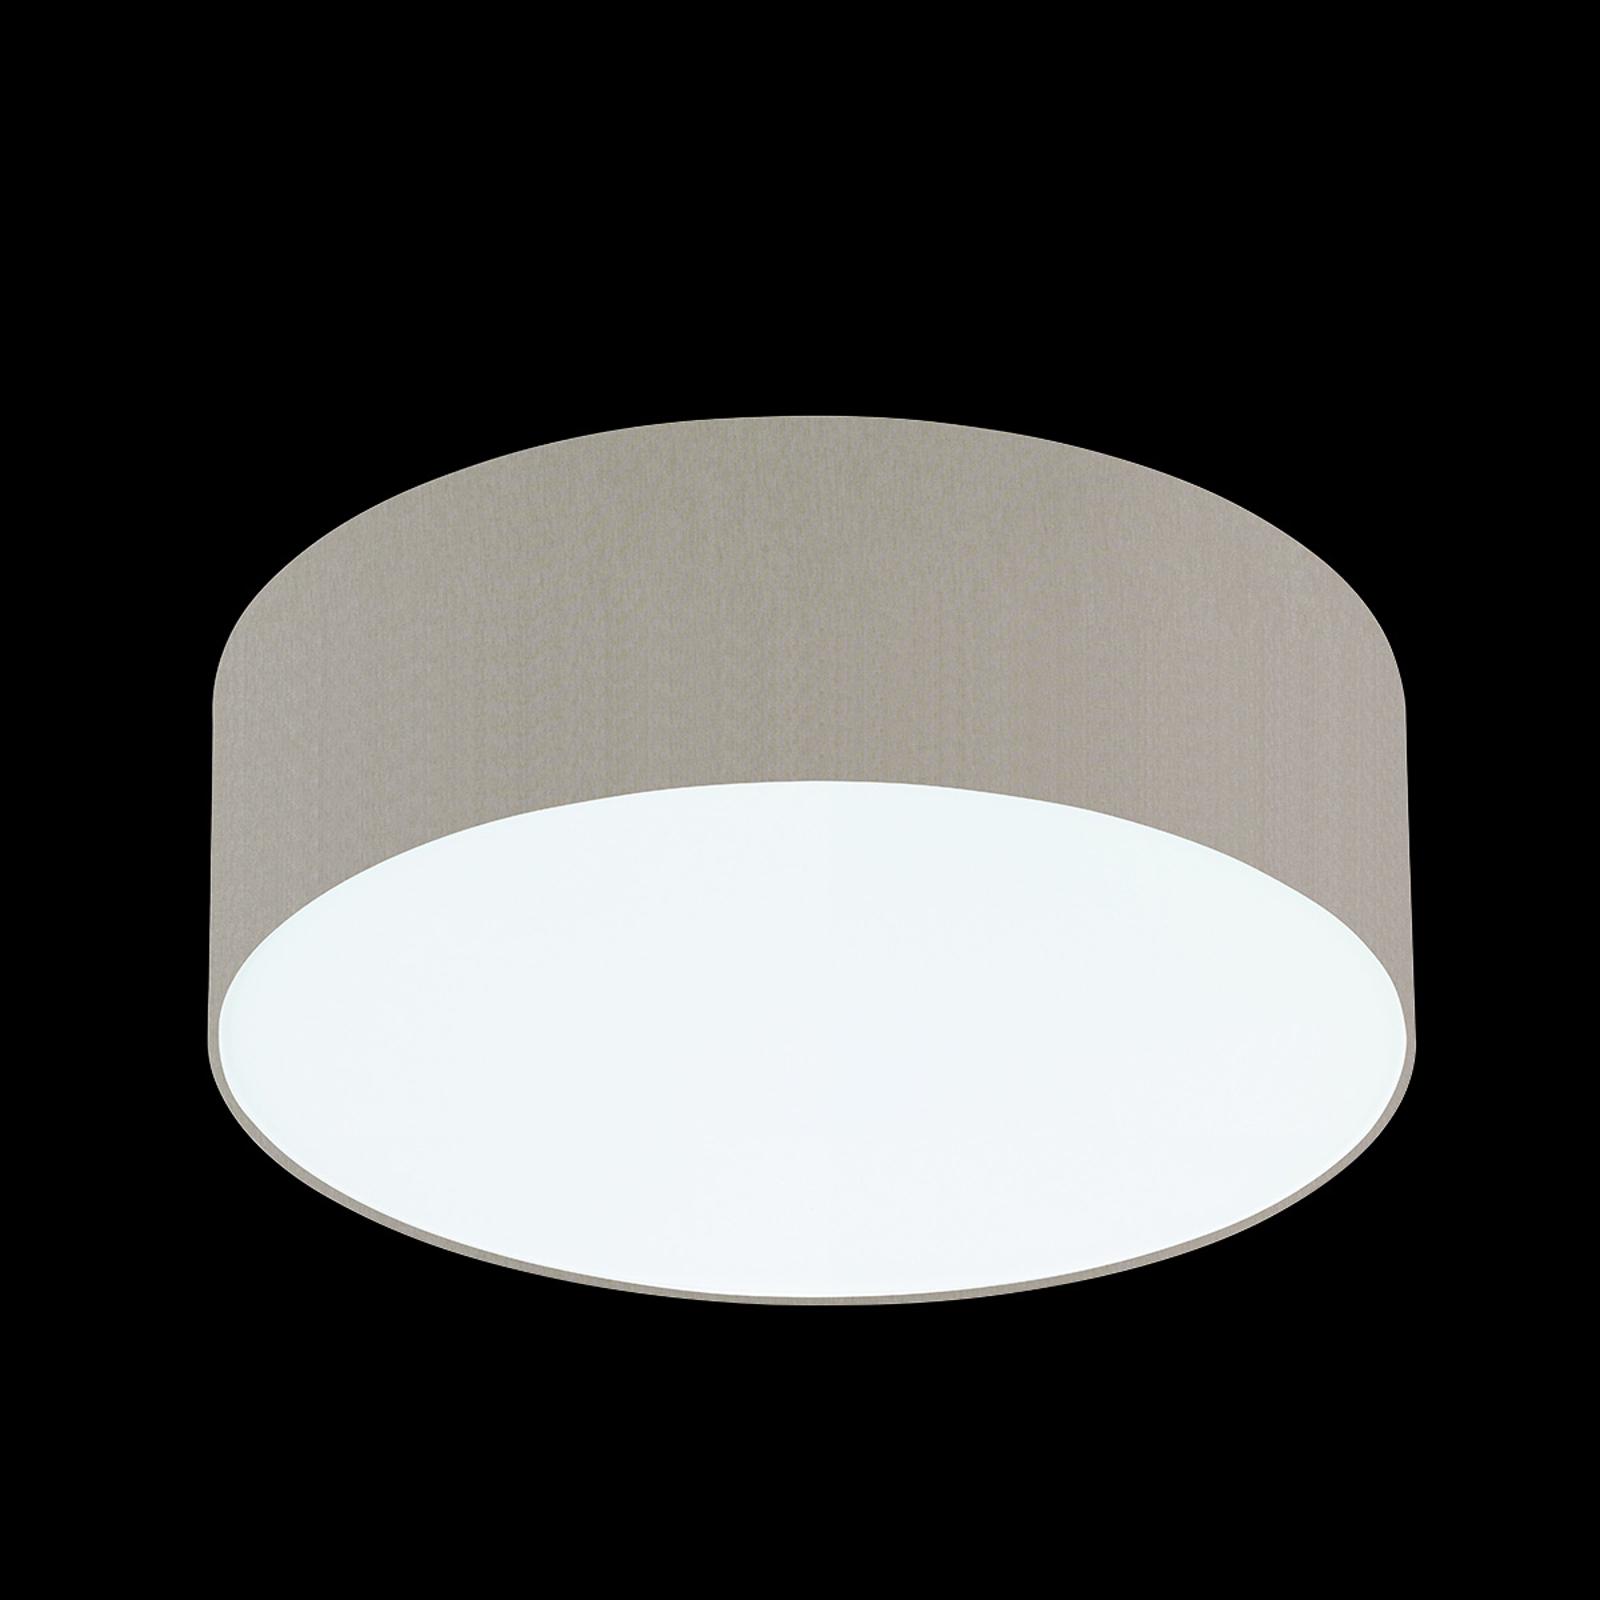 Melangebruine plafondlamp Mara, 50 cm